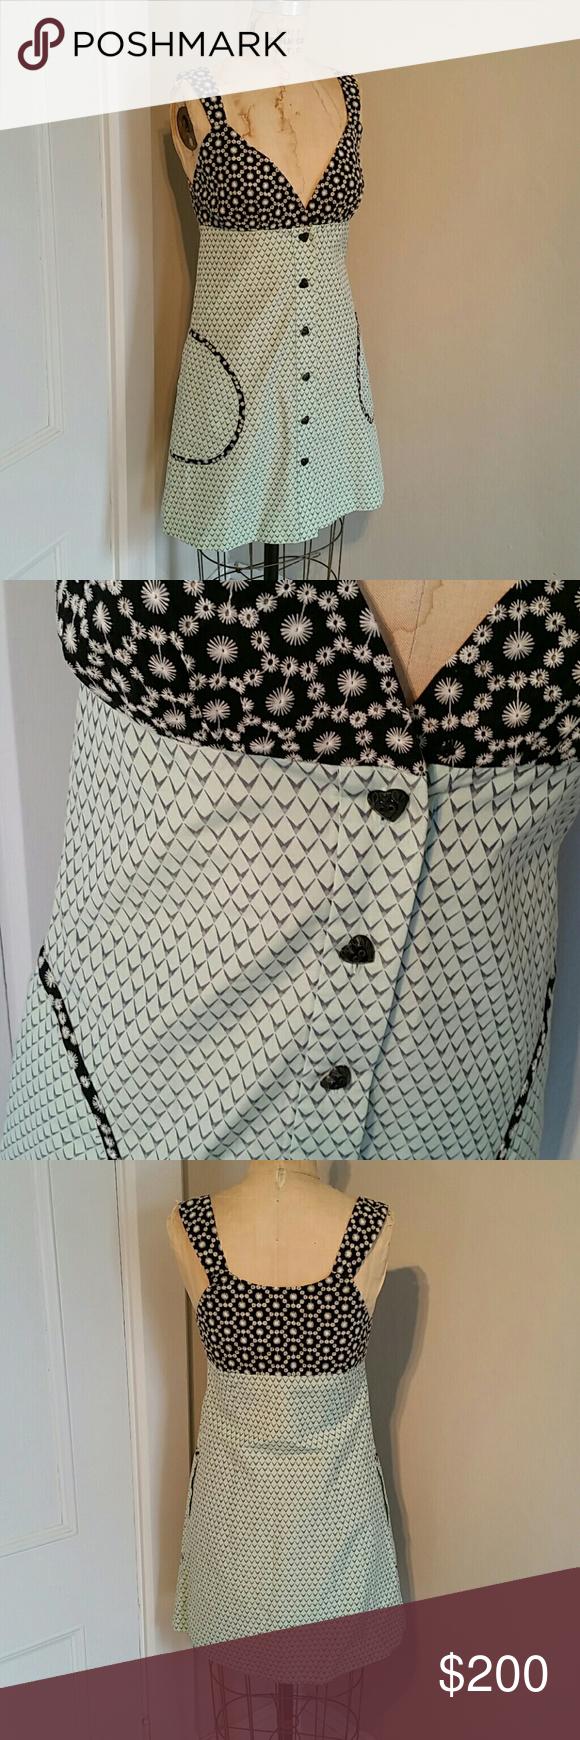 Belly button piercing plus size  Annelore designer NYC unique button tank dress  Heart button Tank